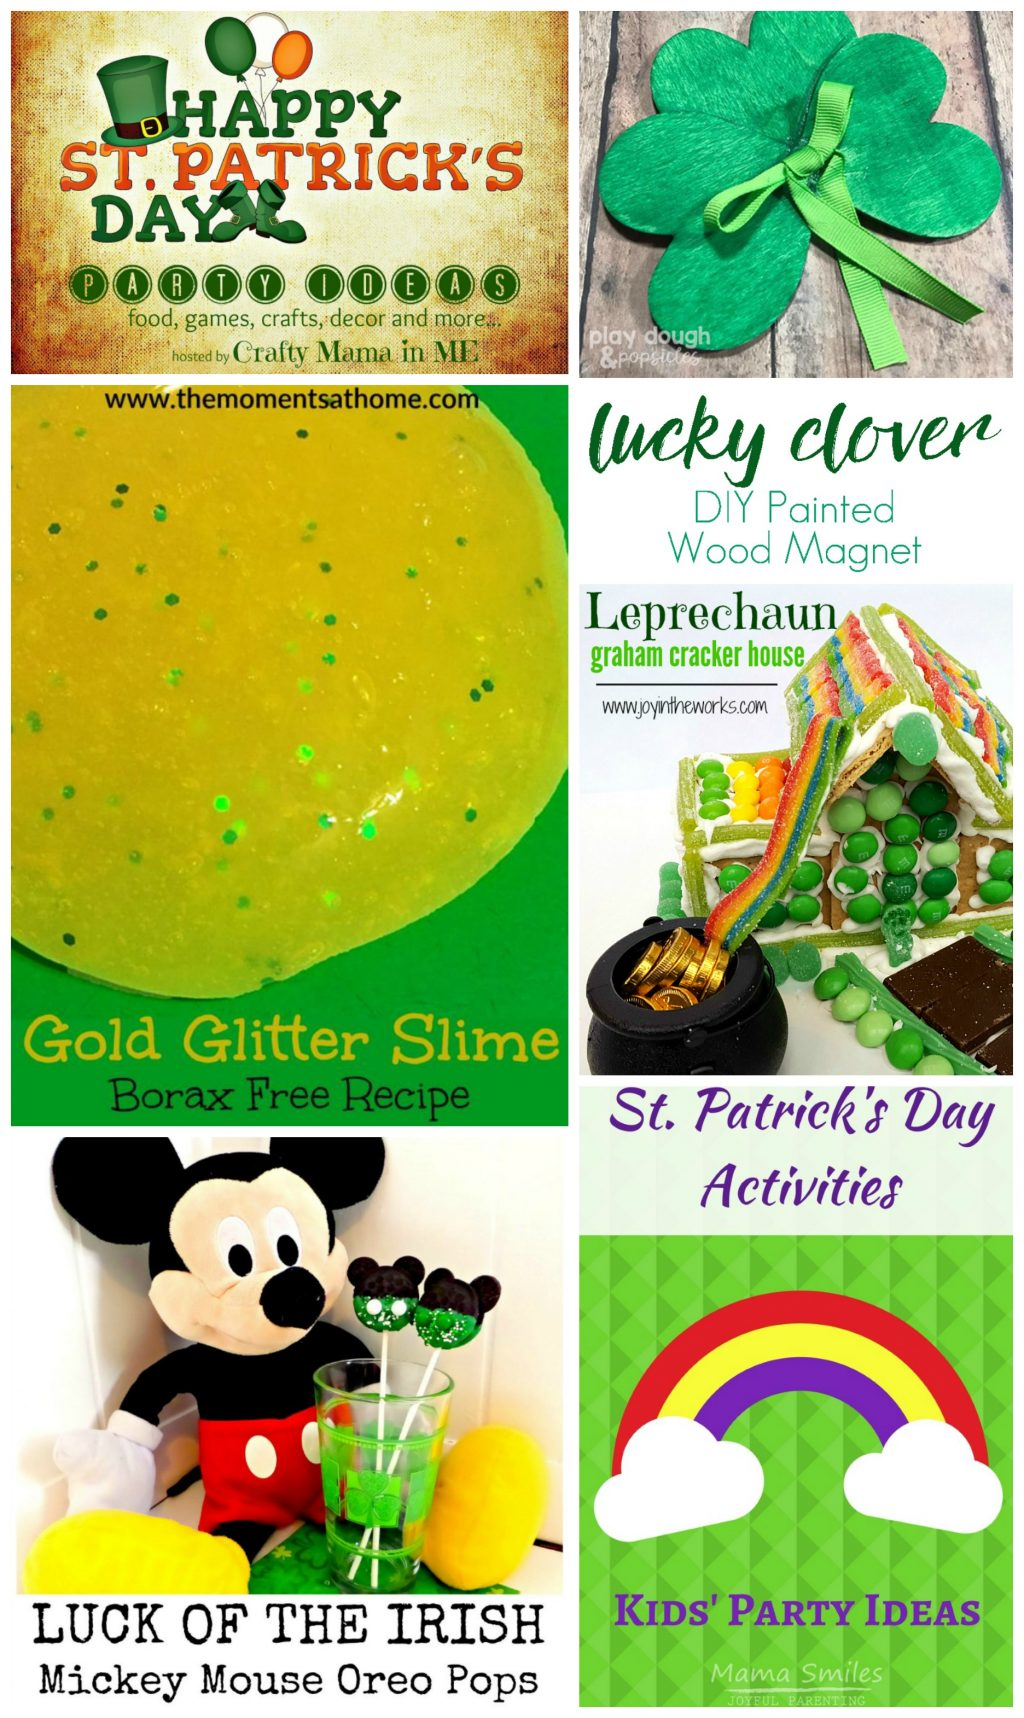 St Patrick's Day Party Ideas Blog Hop